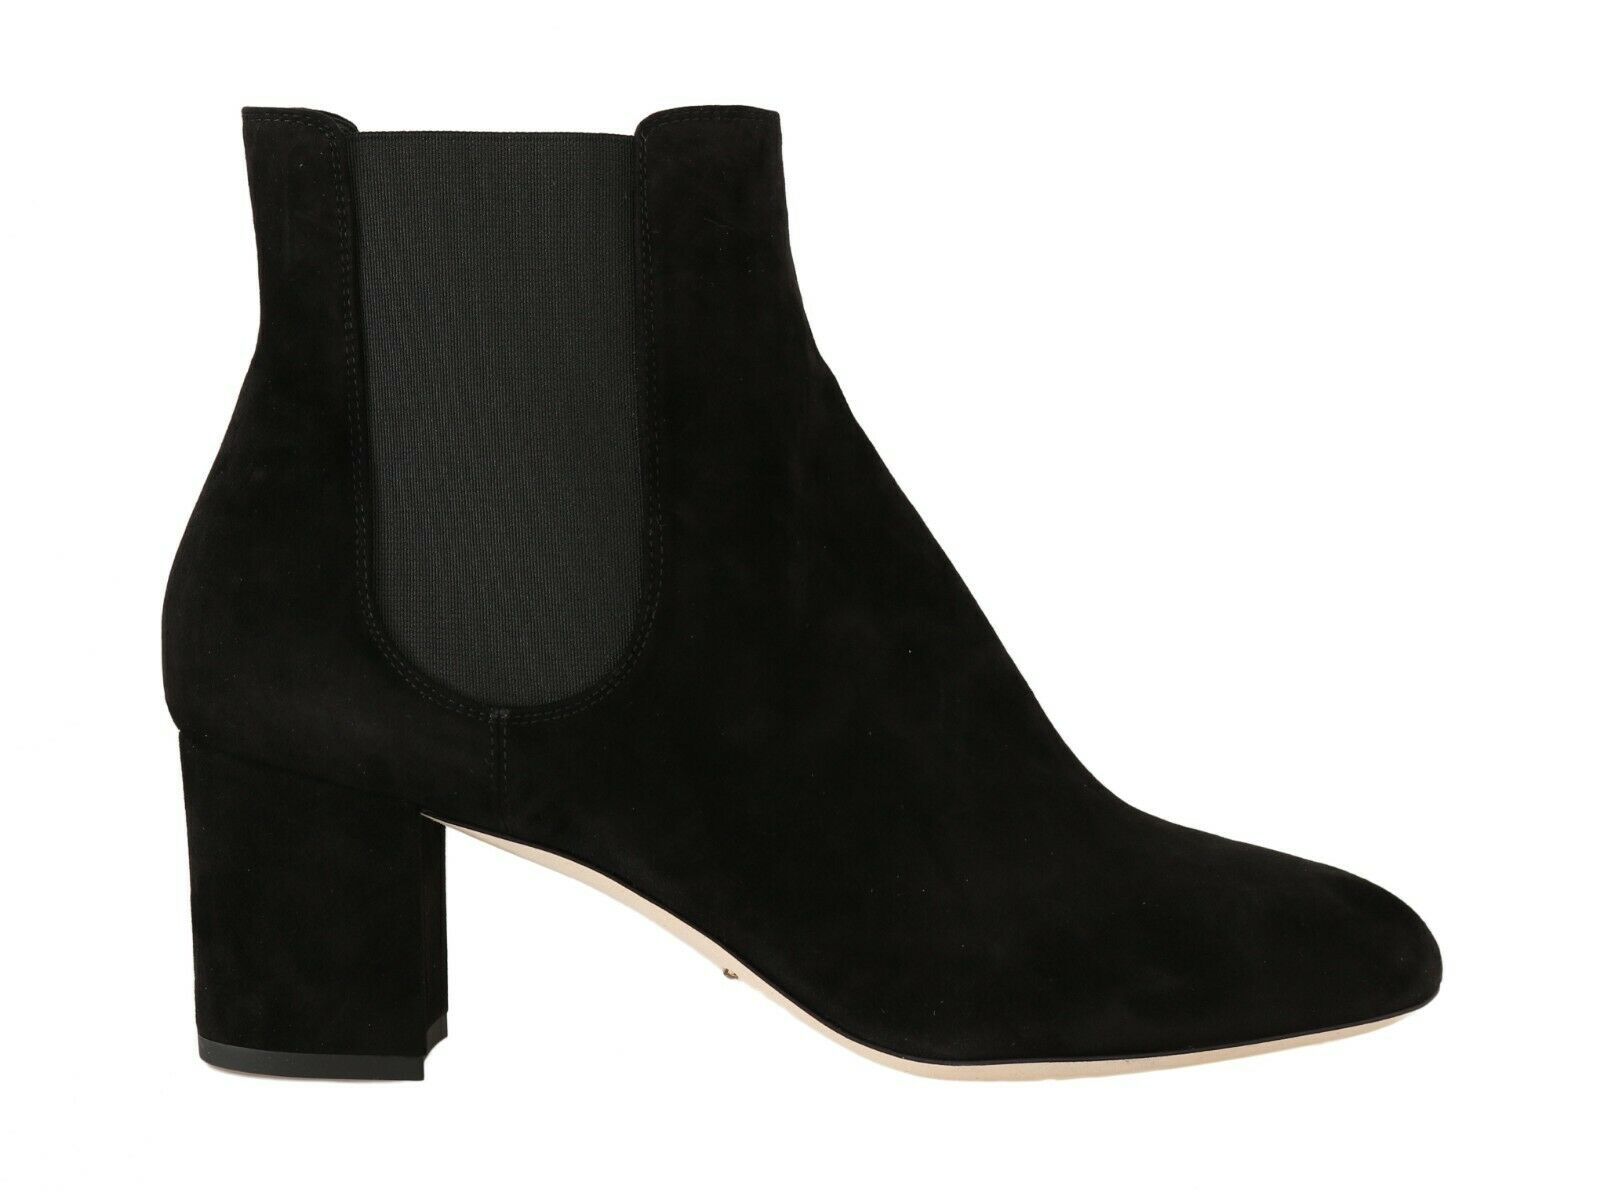 Dolce & Gabbana Women's Suede Chelsea Heels Boots Black LA5598 - EU36.5/US6